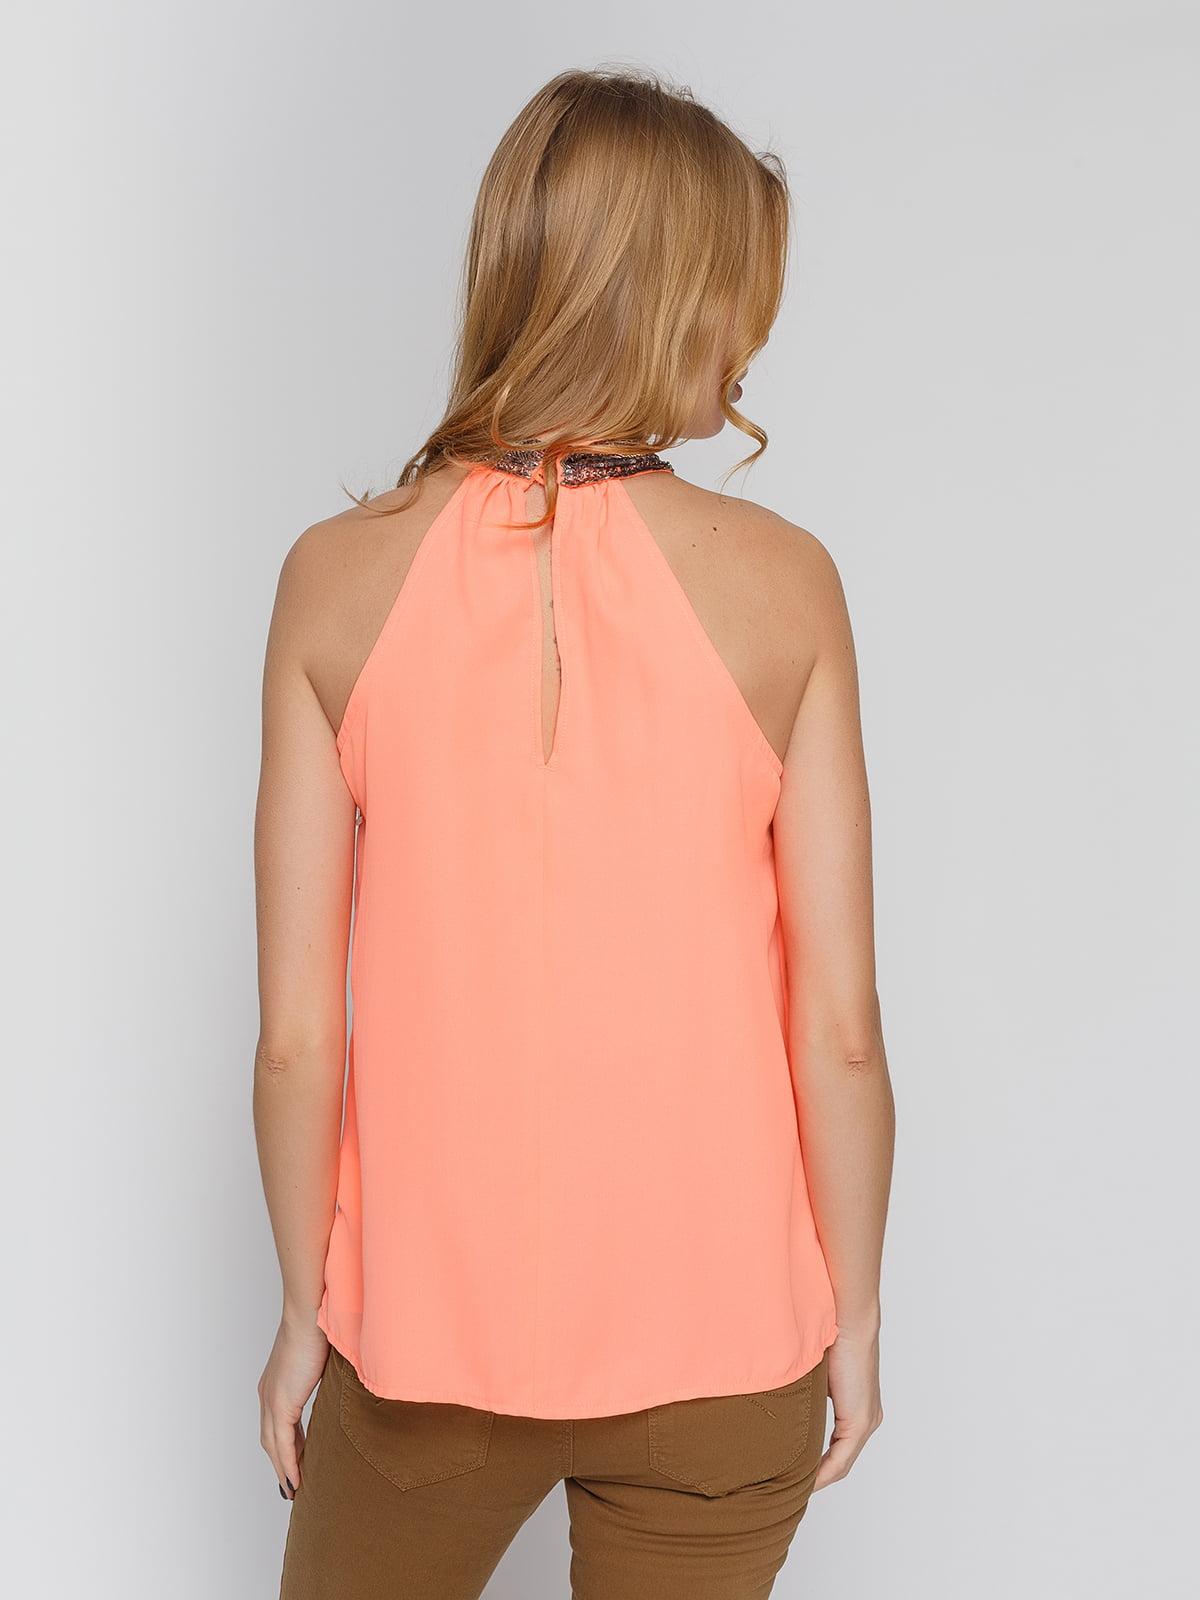 Блуза персикового цвета   4628343   фото 2